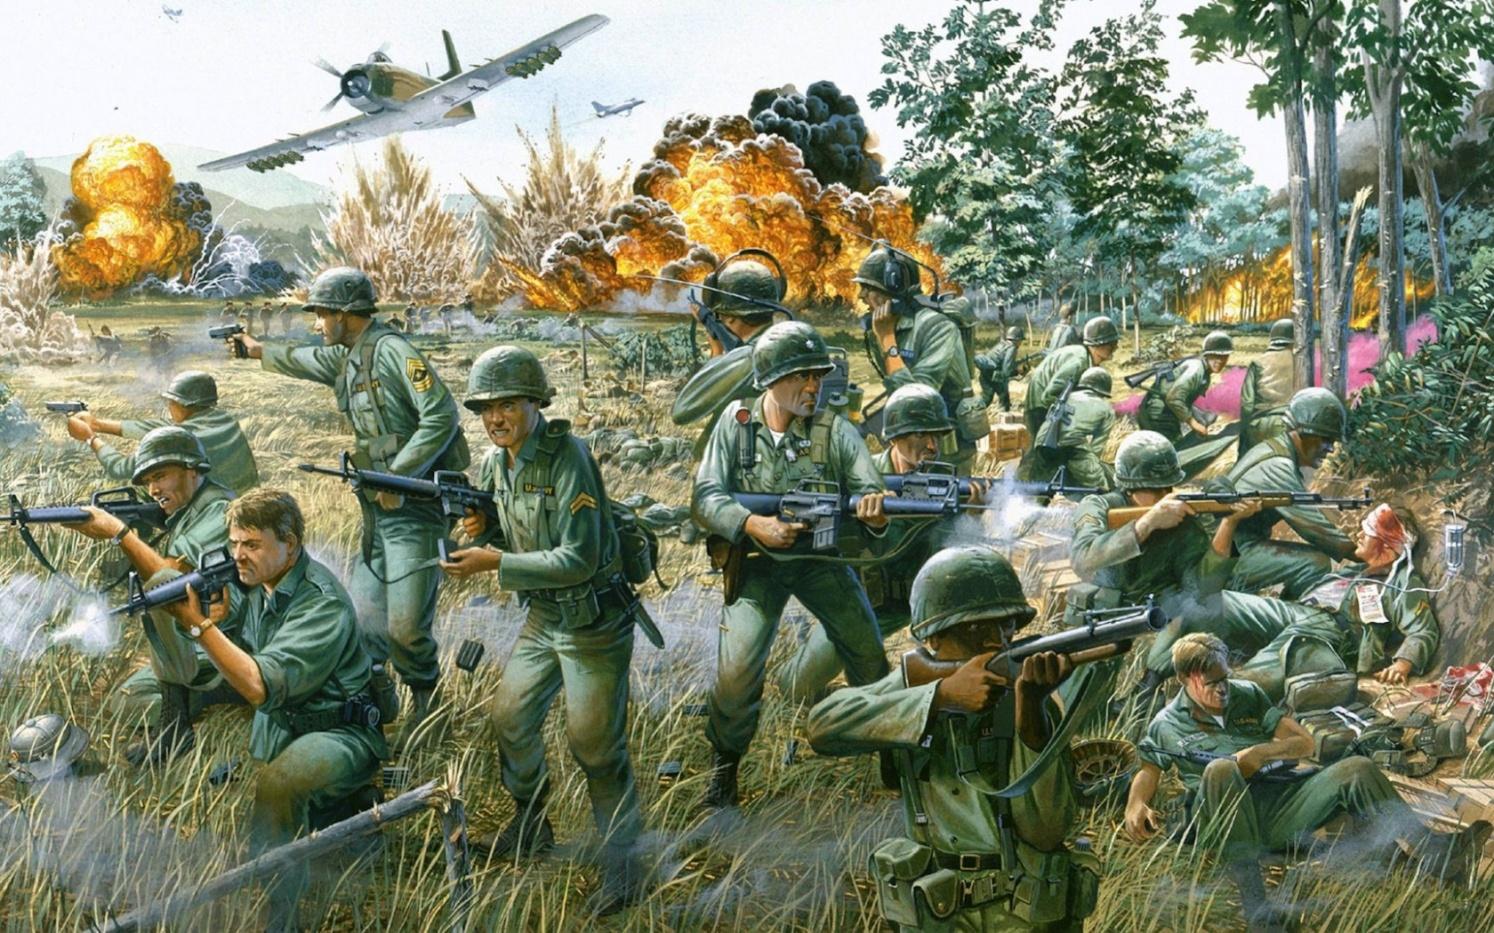 https://weaponsandwarfare.files.wordpress.com/2015/09/battle_of_ia_drang-1680x1050.jpg?w=1494&h=934